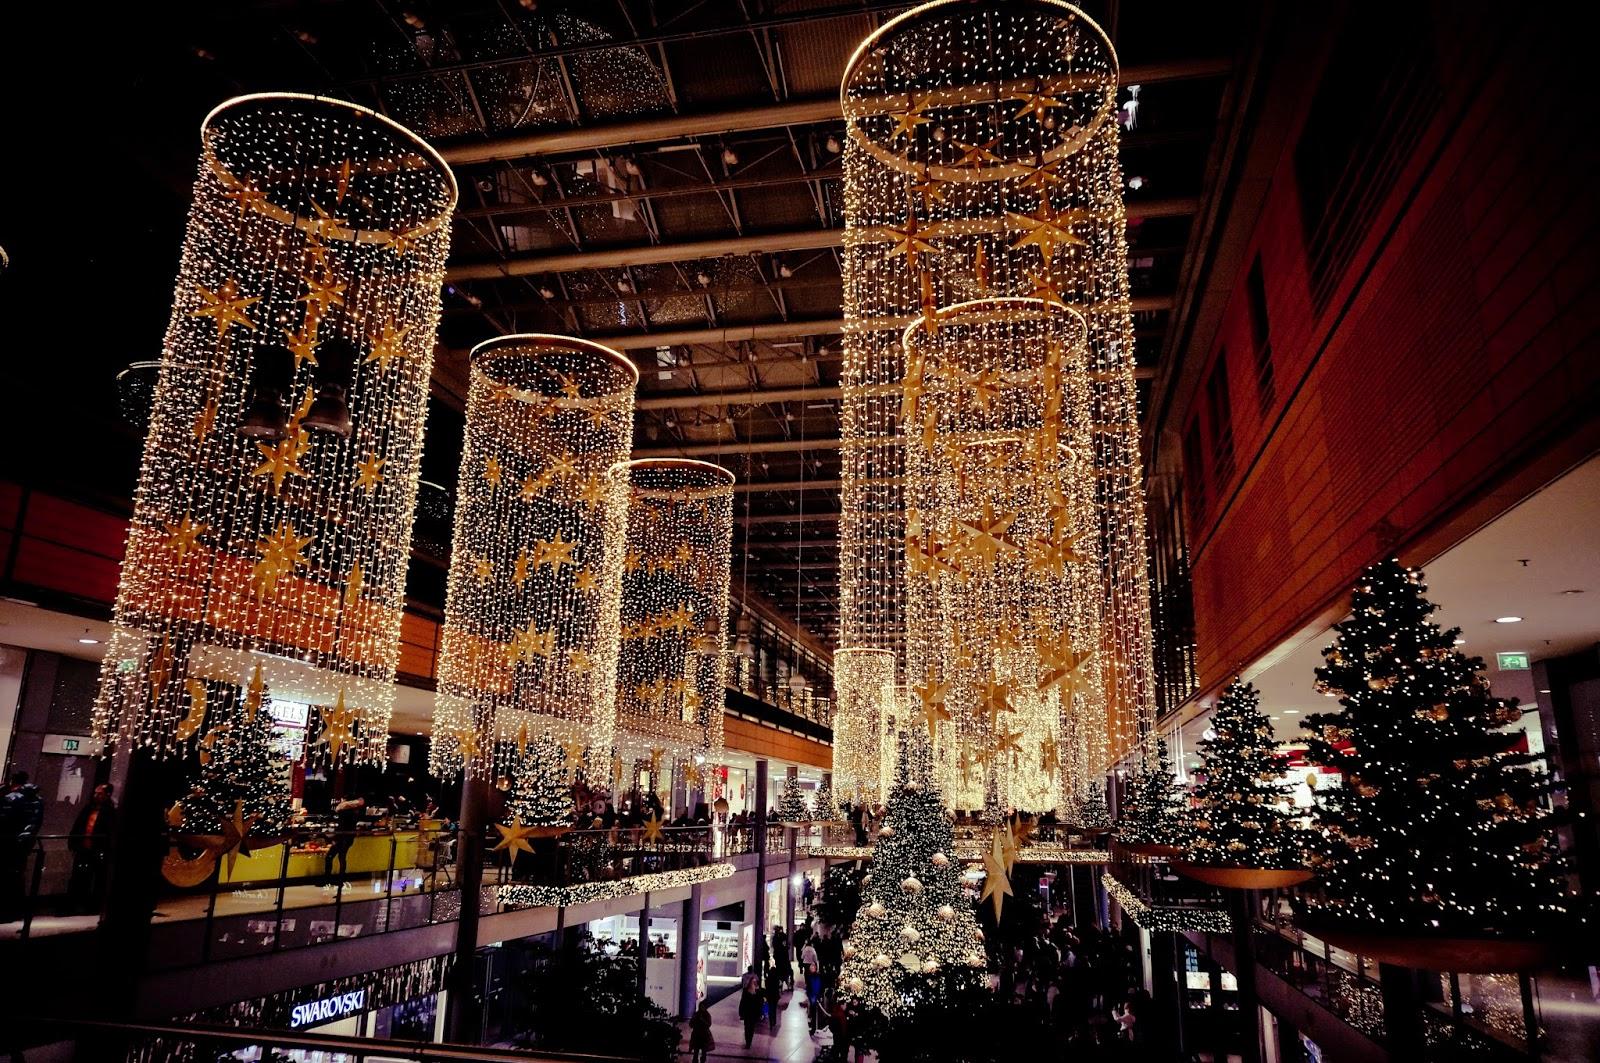 centrum handlowe, świąteczne iluminacje